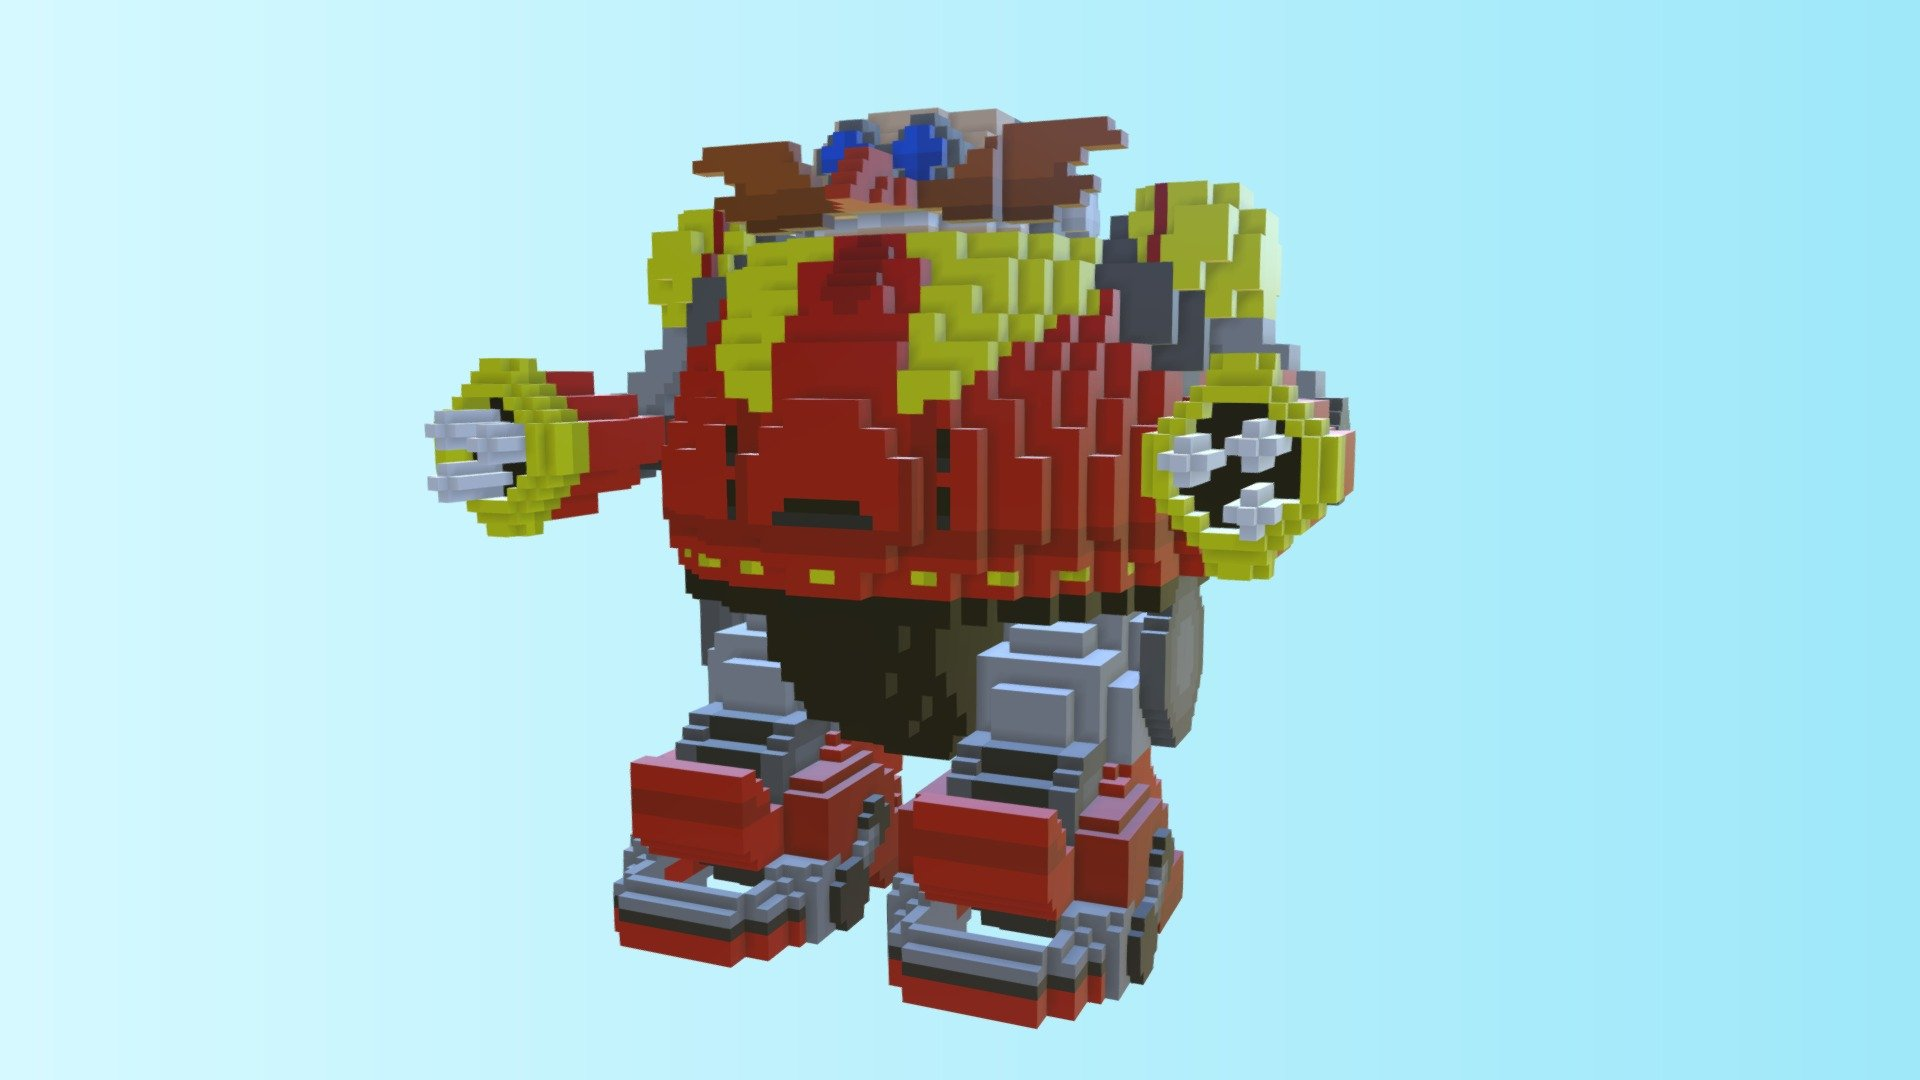 Death Egg Robot Download Free 3d Model By Taranza Codepixel 401a169 Sketchfab